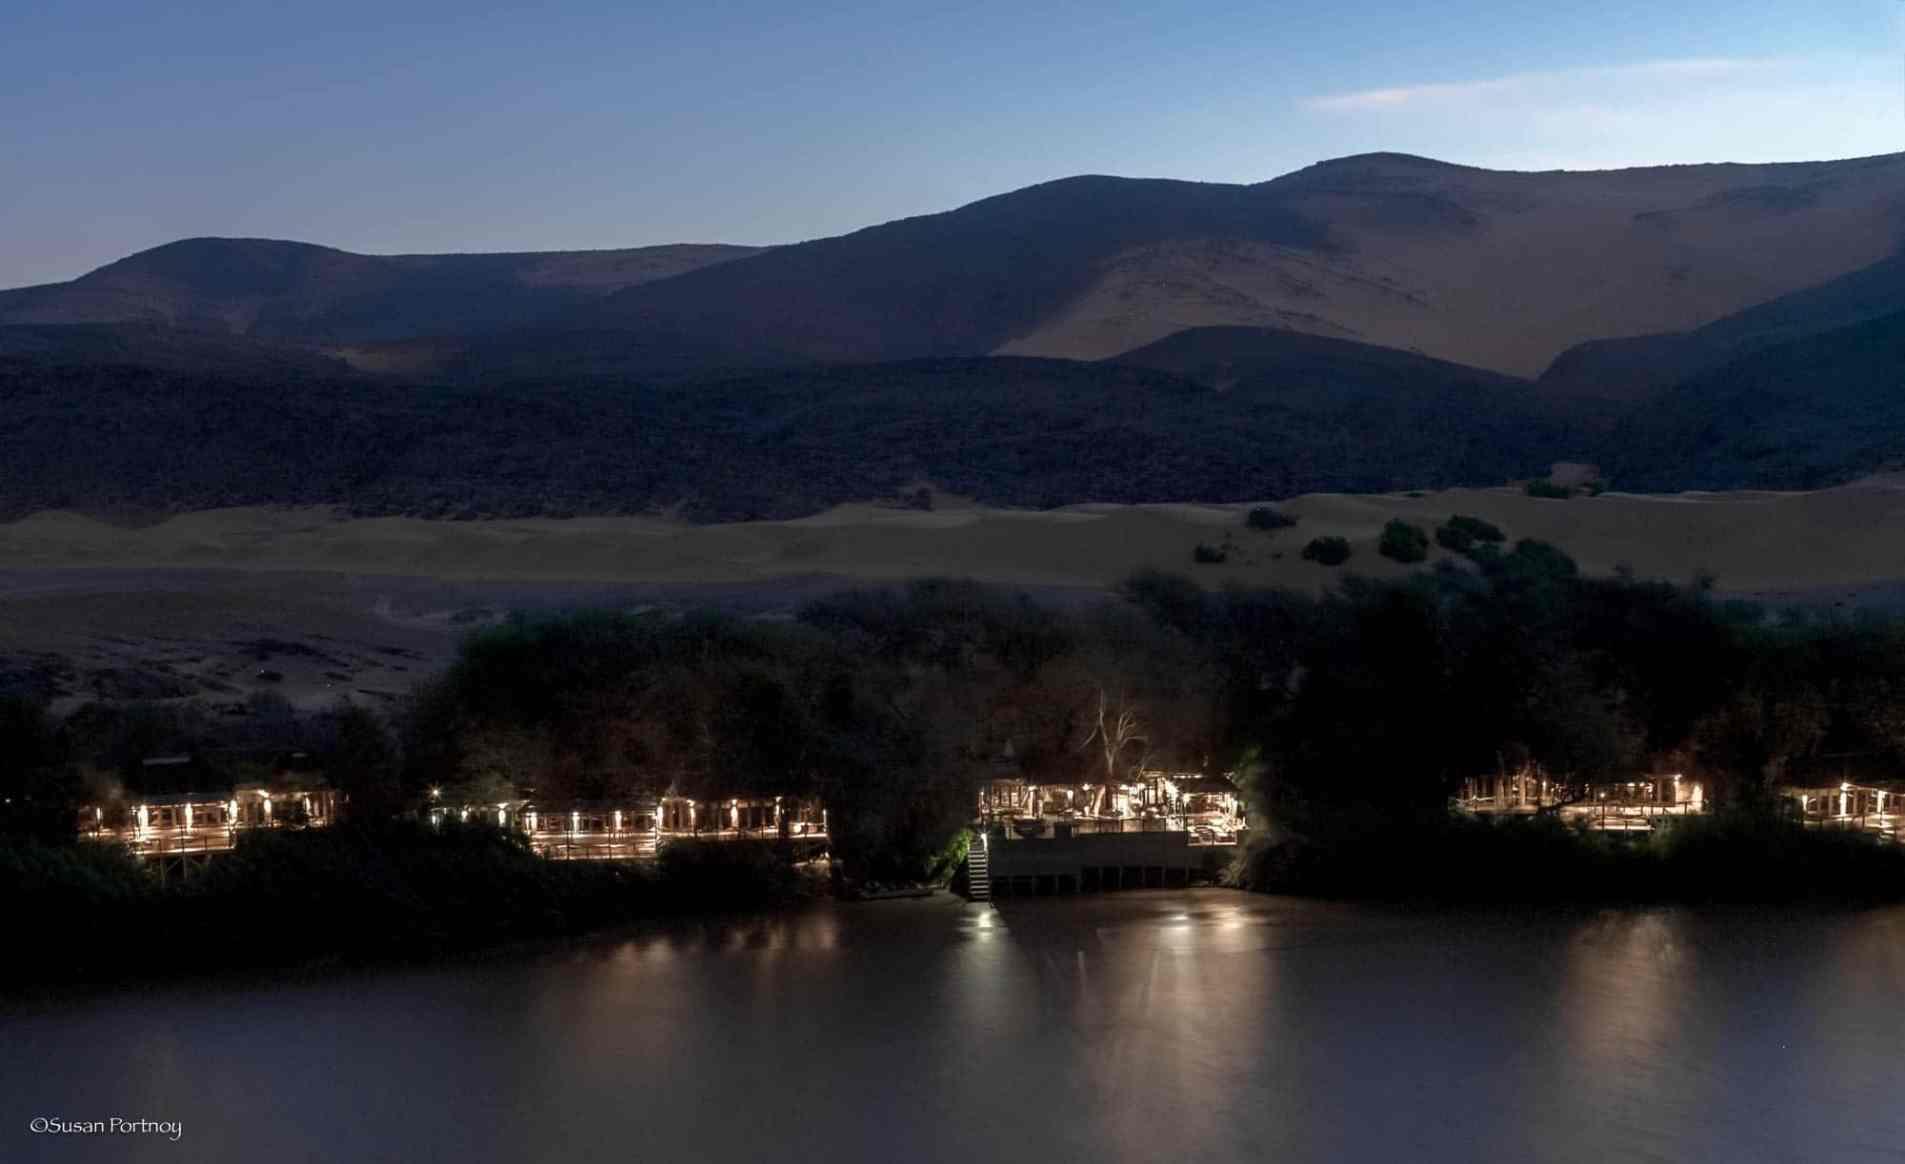 Serra Cafema Camp as viewed from Angola